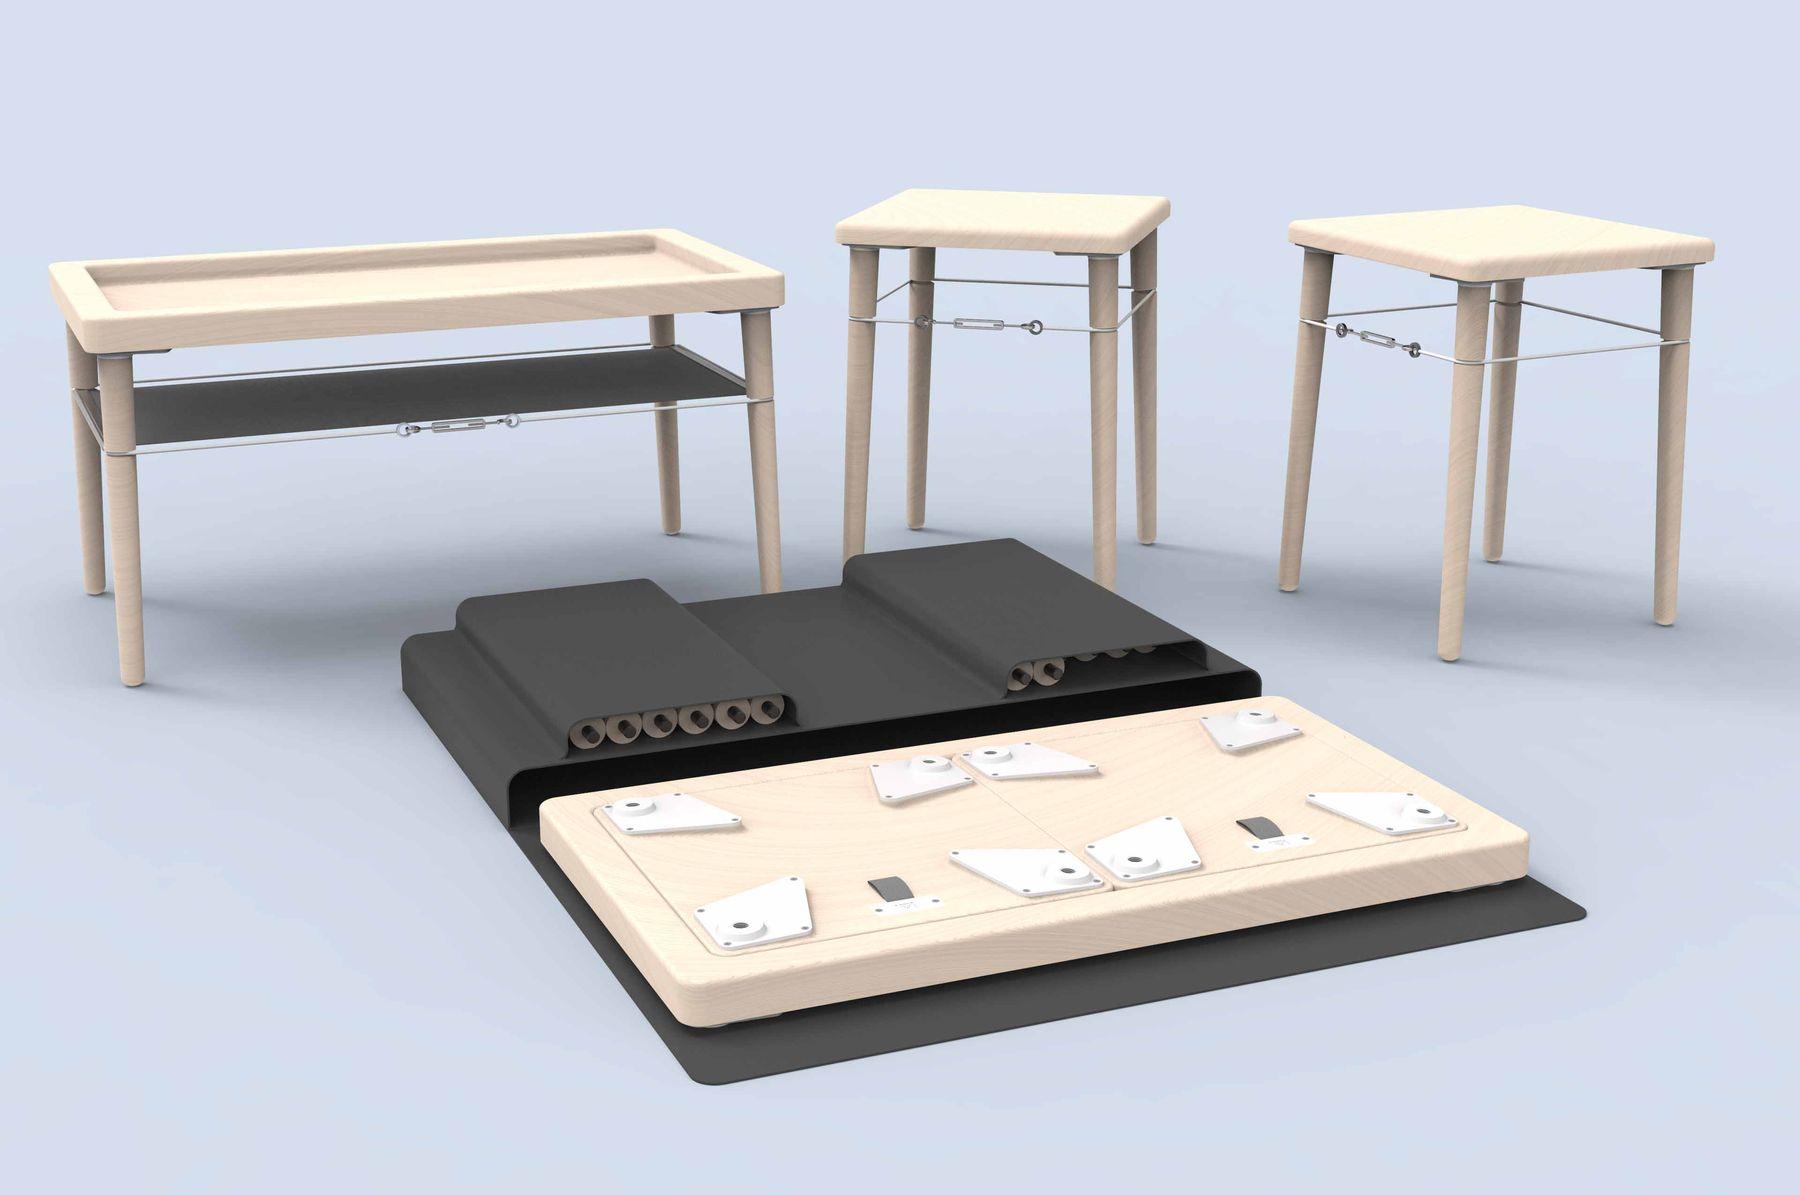 Kit Furniture, James Elliot, BA (Hons) Product Design, 2019